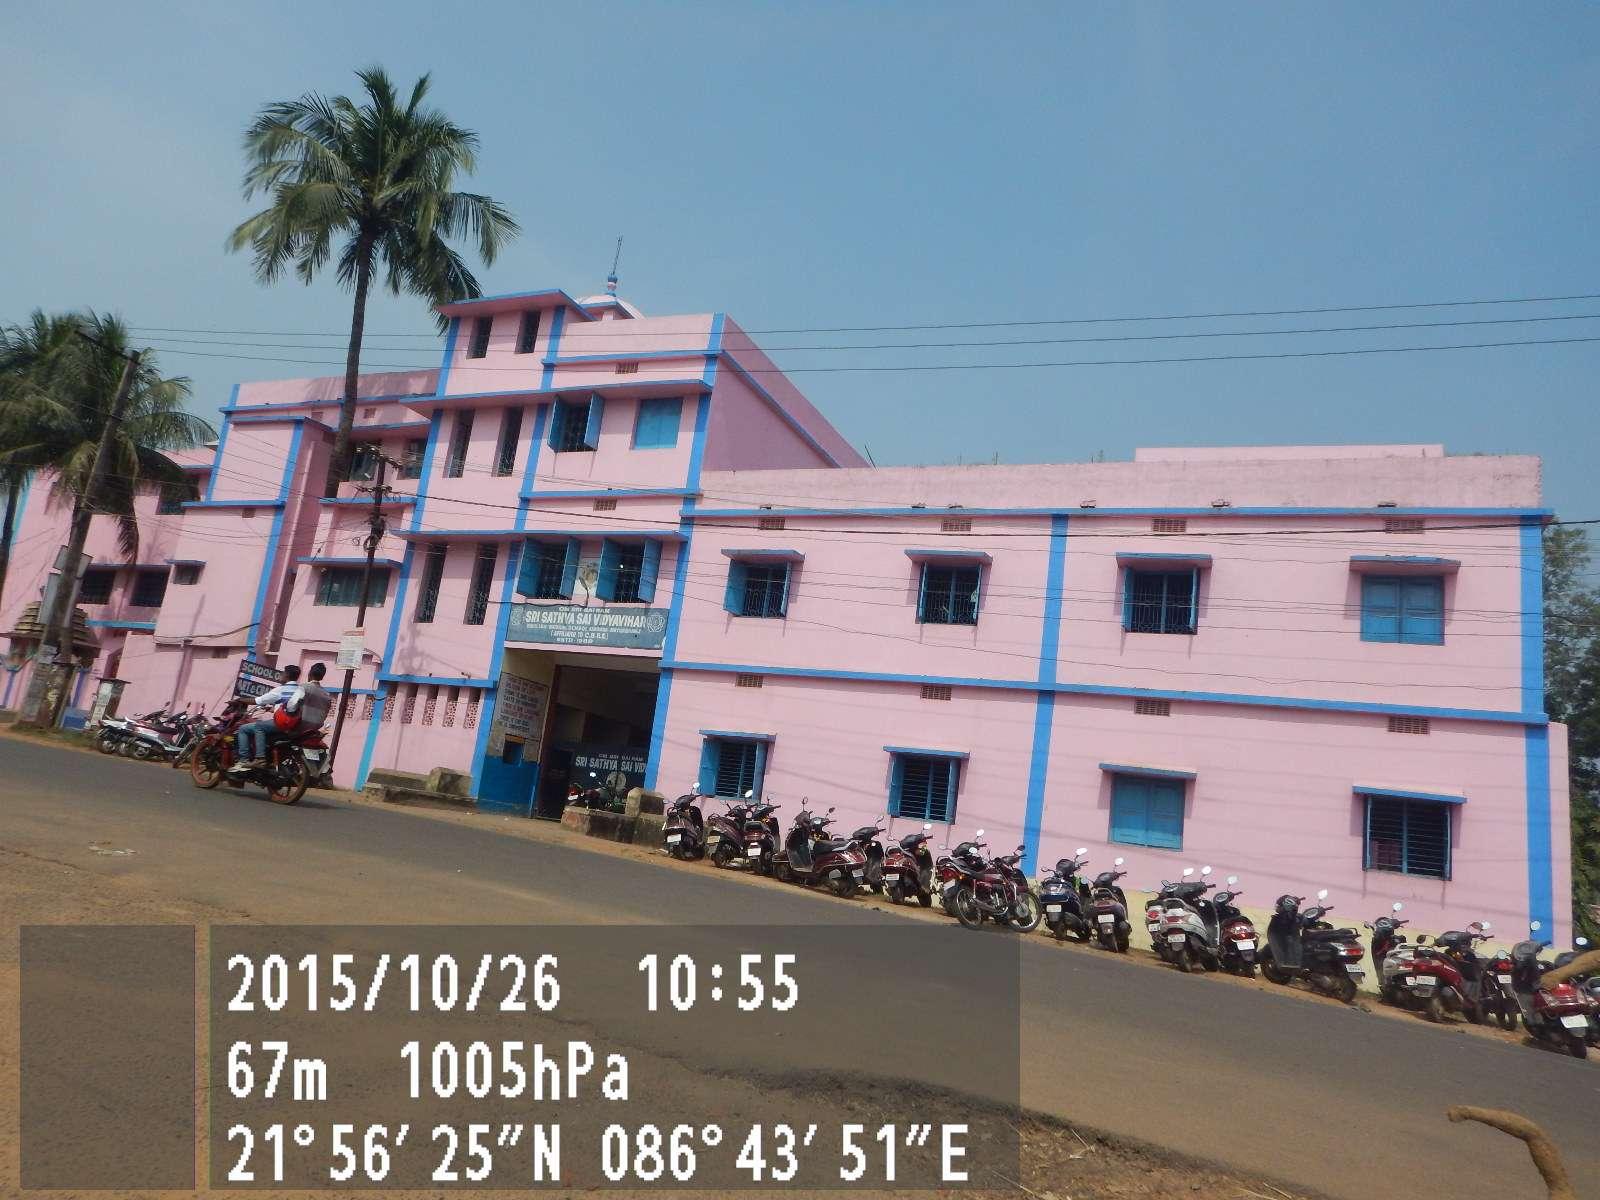 SRI SATHYA SAI VIDYA VIHAR ENG MED SCHOOL BAGHARA ROAD WARD NO 3 AT PO BARIPADA DISTT MAYURBHANJ ORISSA 1530034